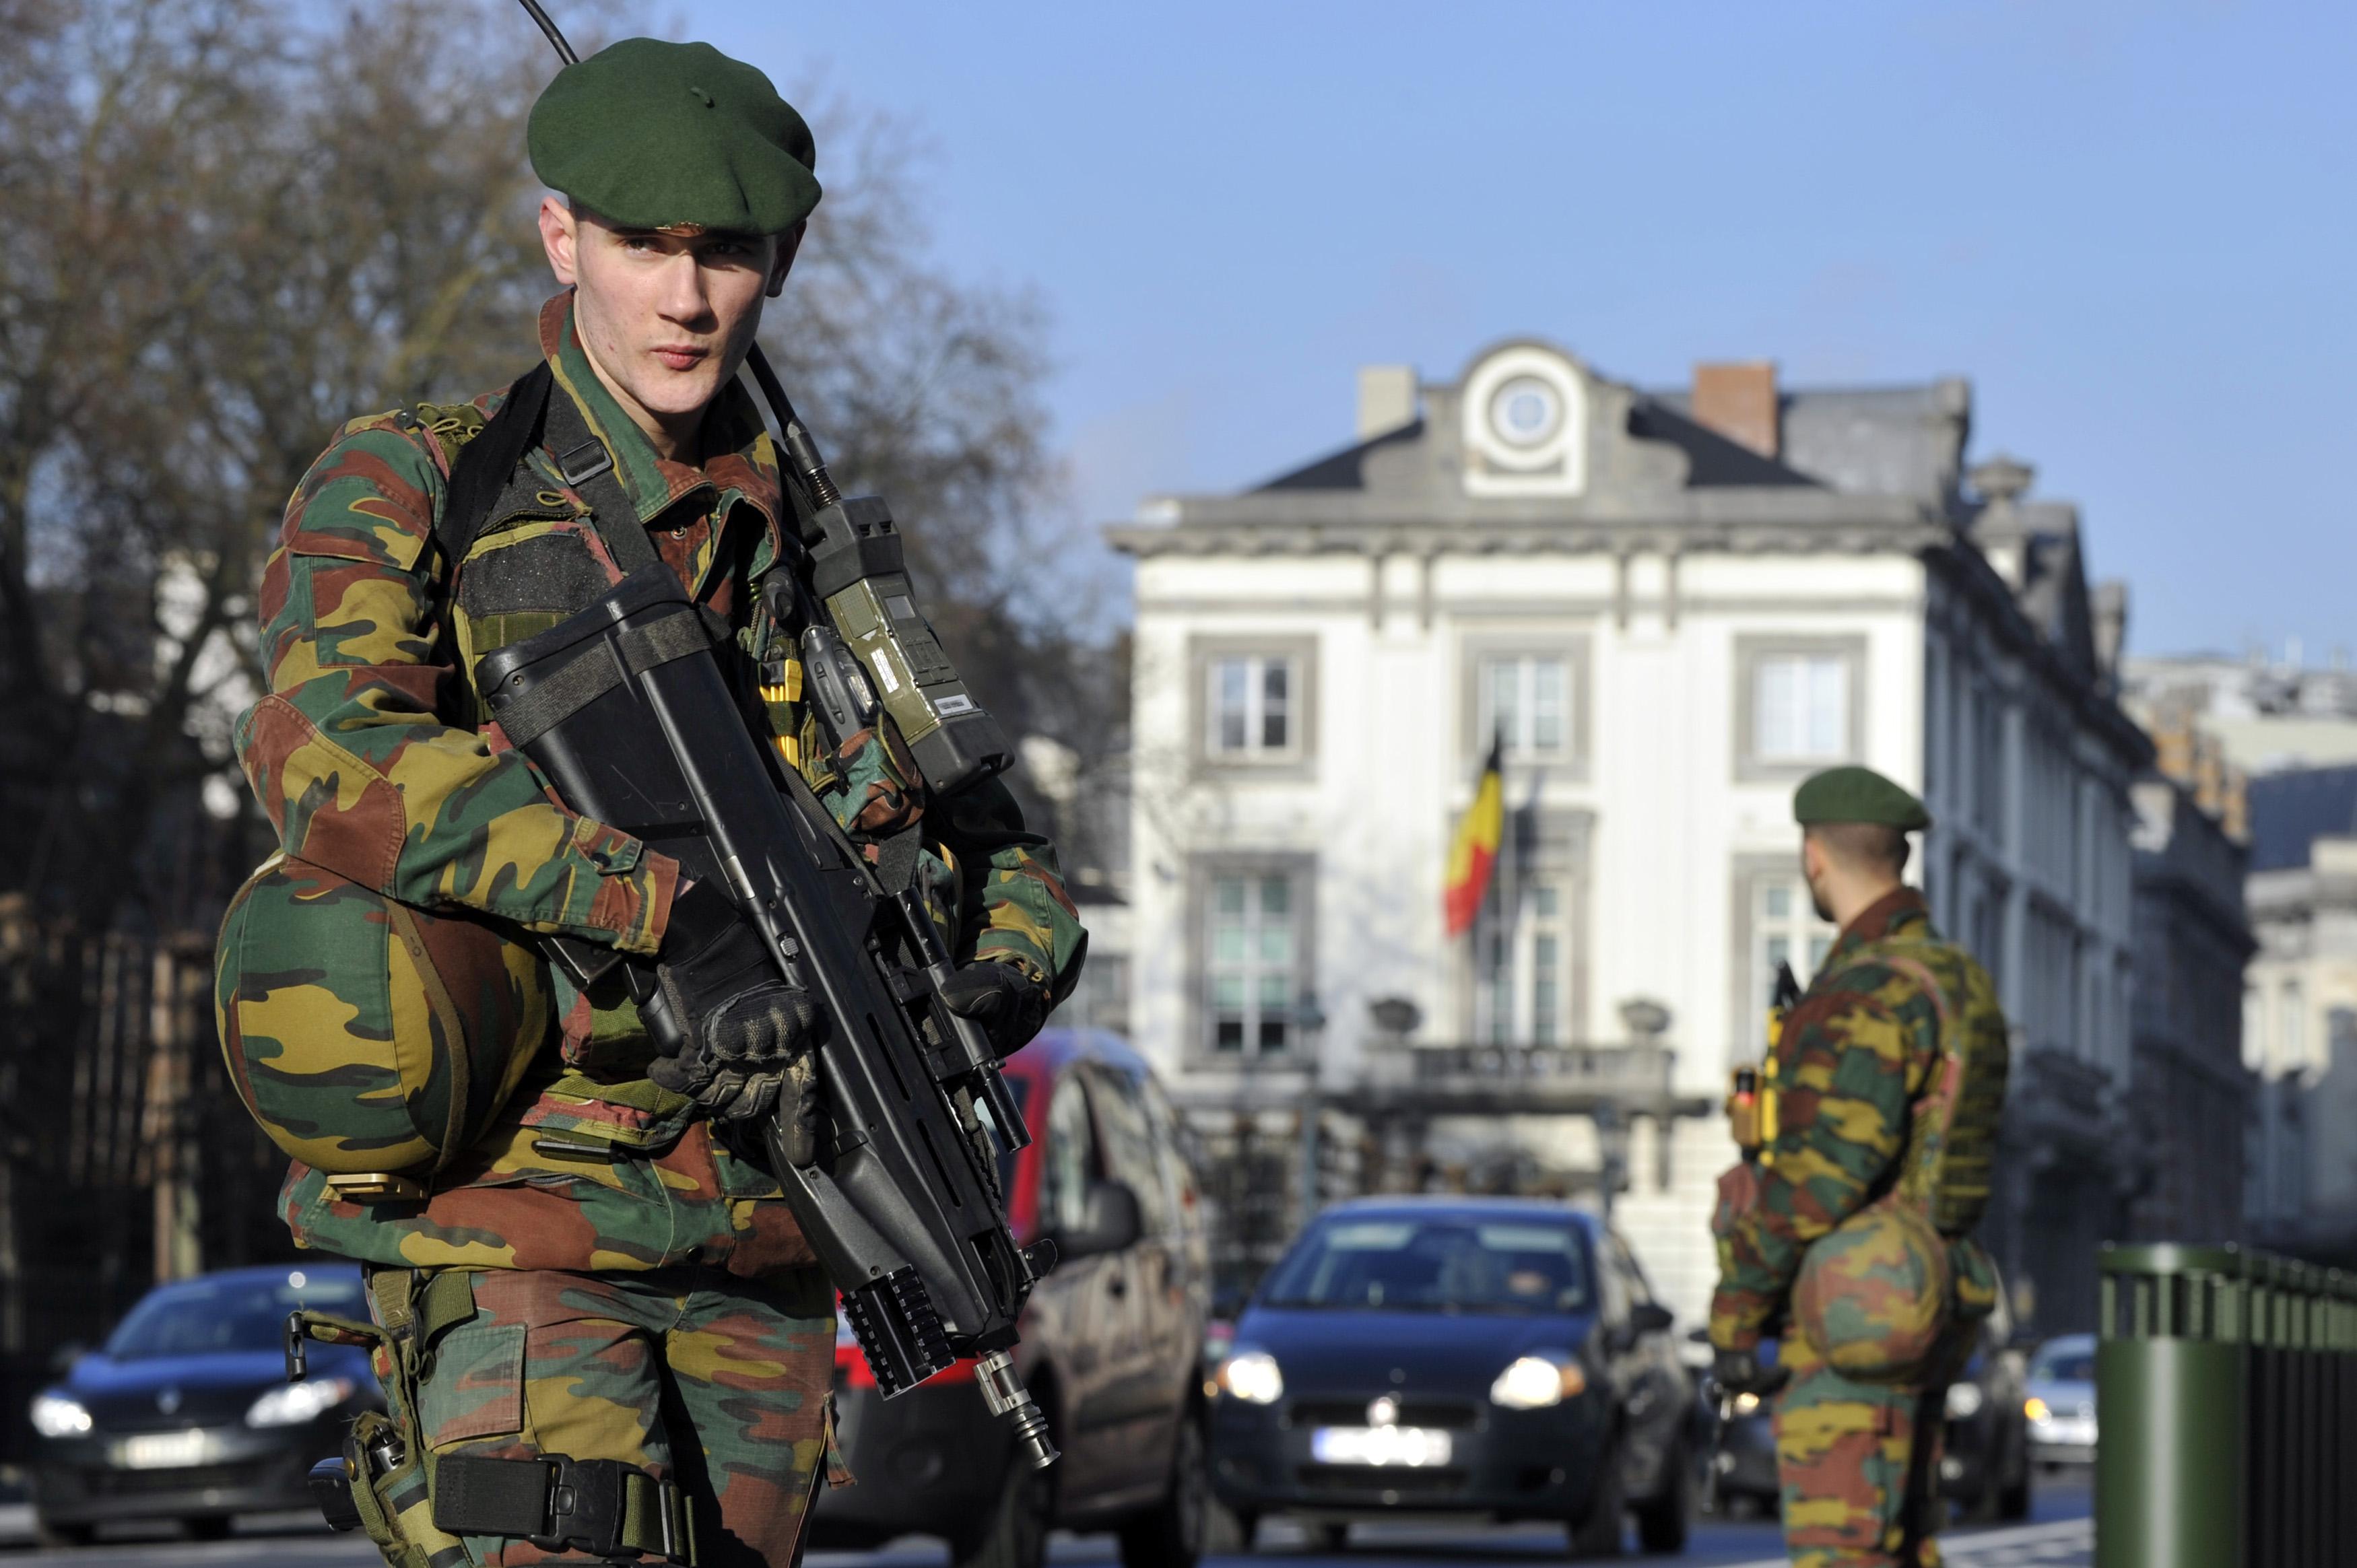 Belgian soldiers guard outside the U.S. Embassy in Brussels near the Belgian Parliament on Jan. 17, 2015.